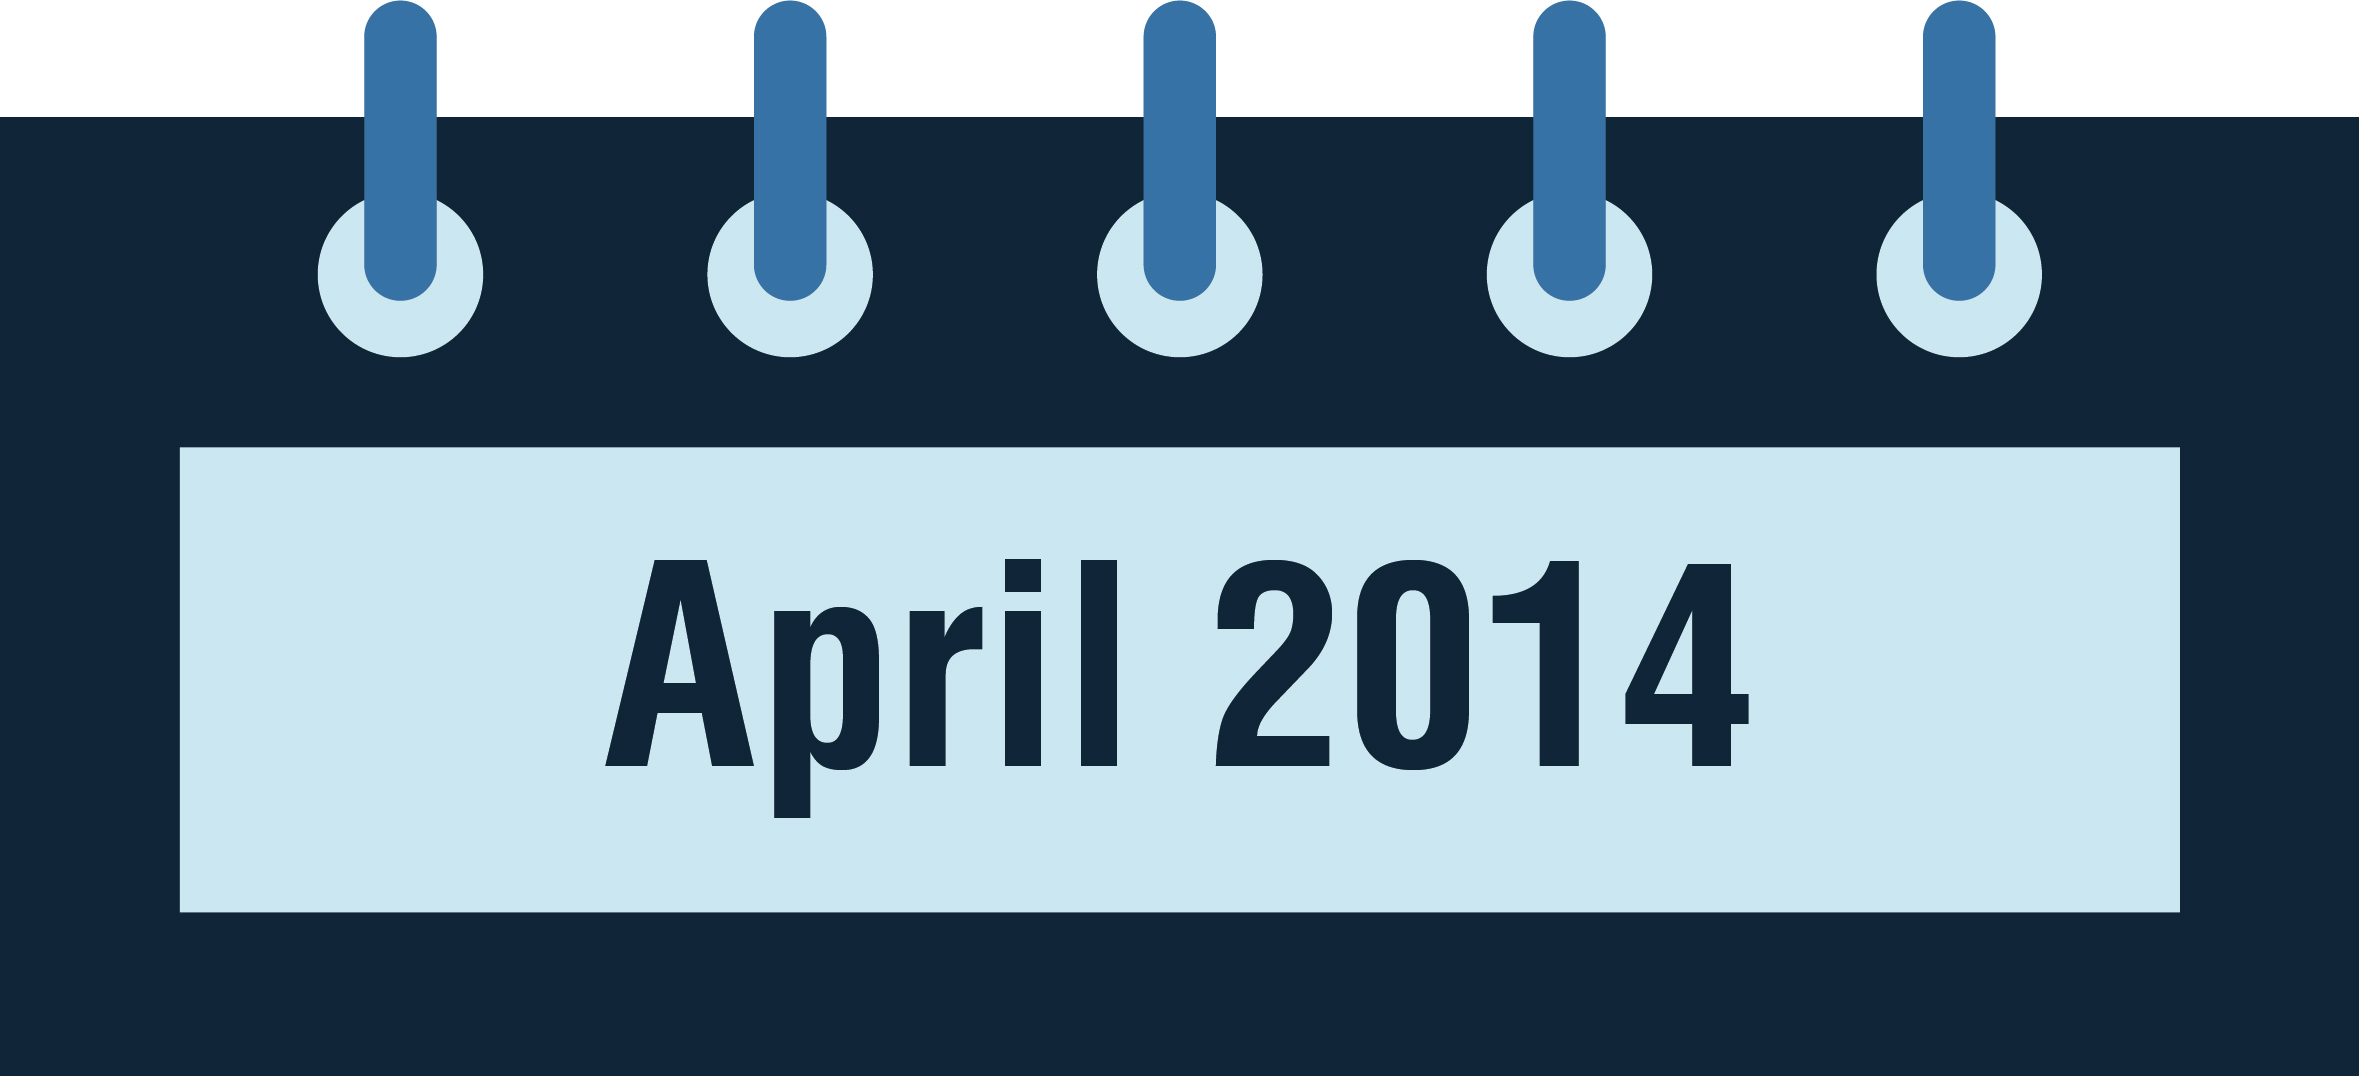 NeuroCheck History - April 2014 (Image © NeuroCheck)